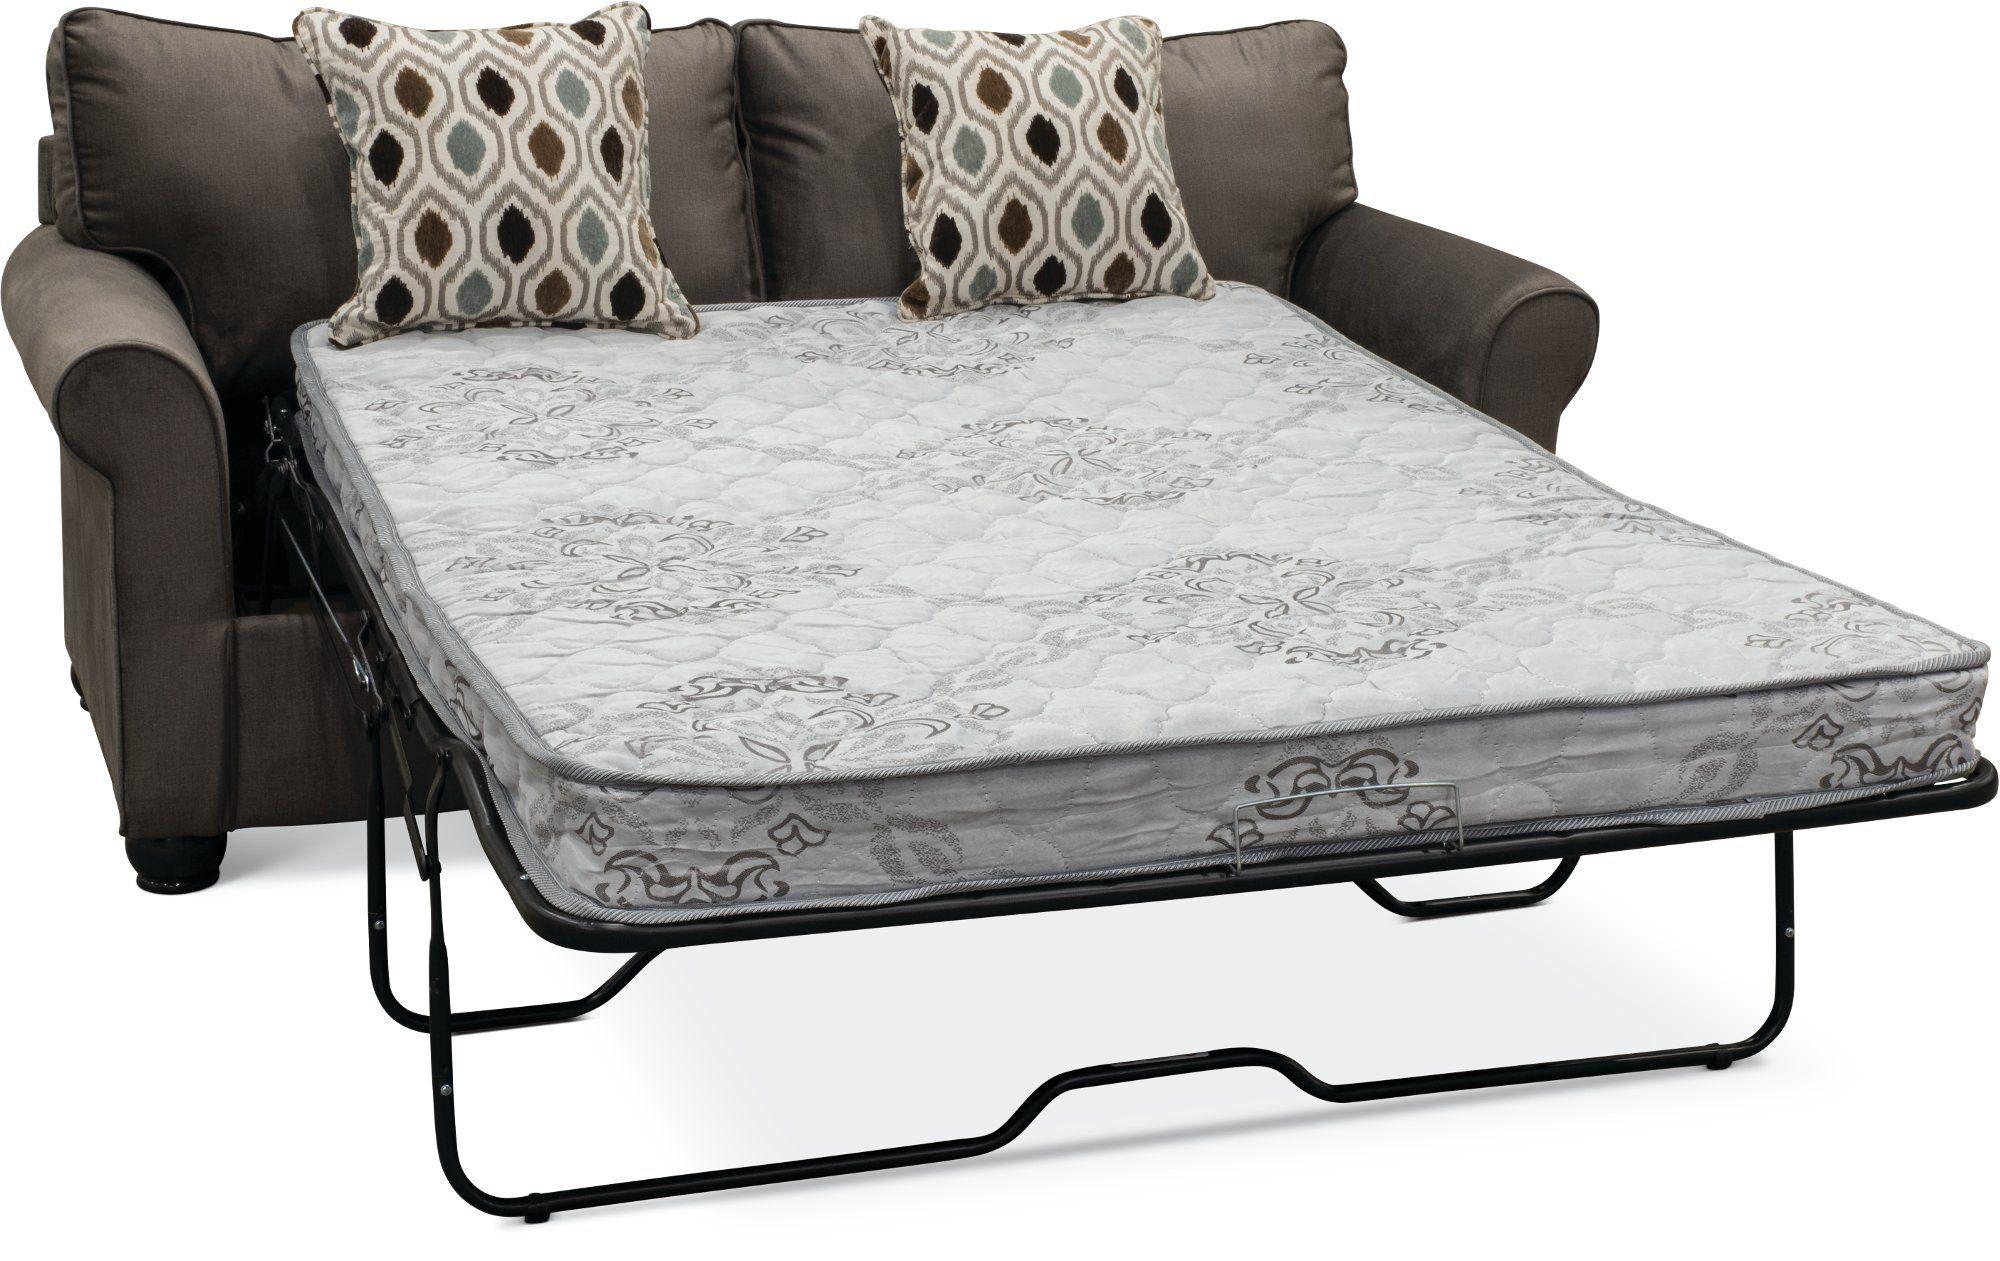 Smoke Gray Full Sofa Bed Jojo Sofa Bed Sofa Mattress Dimensions